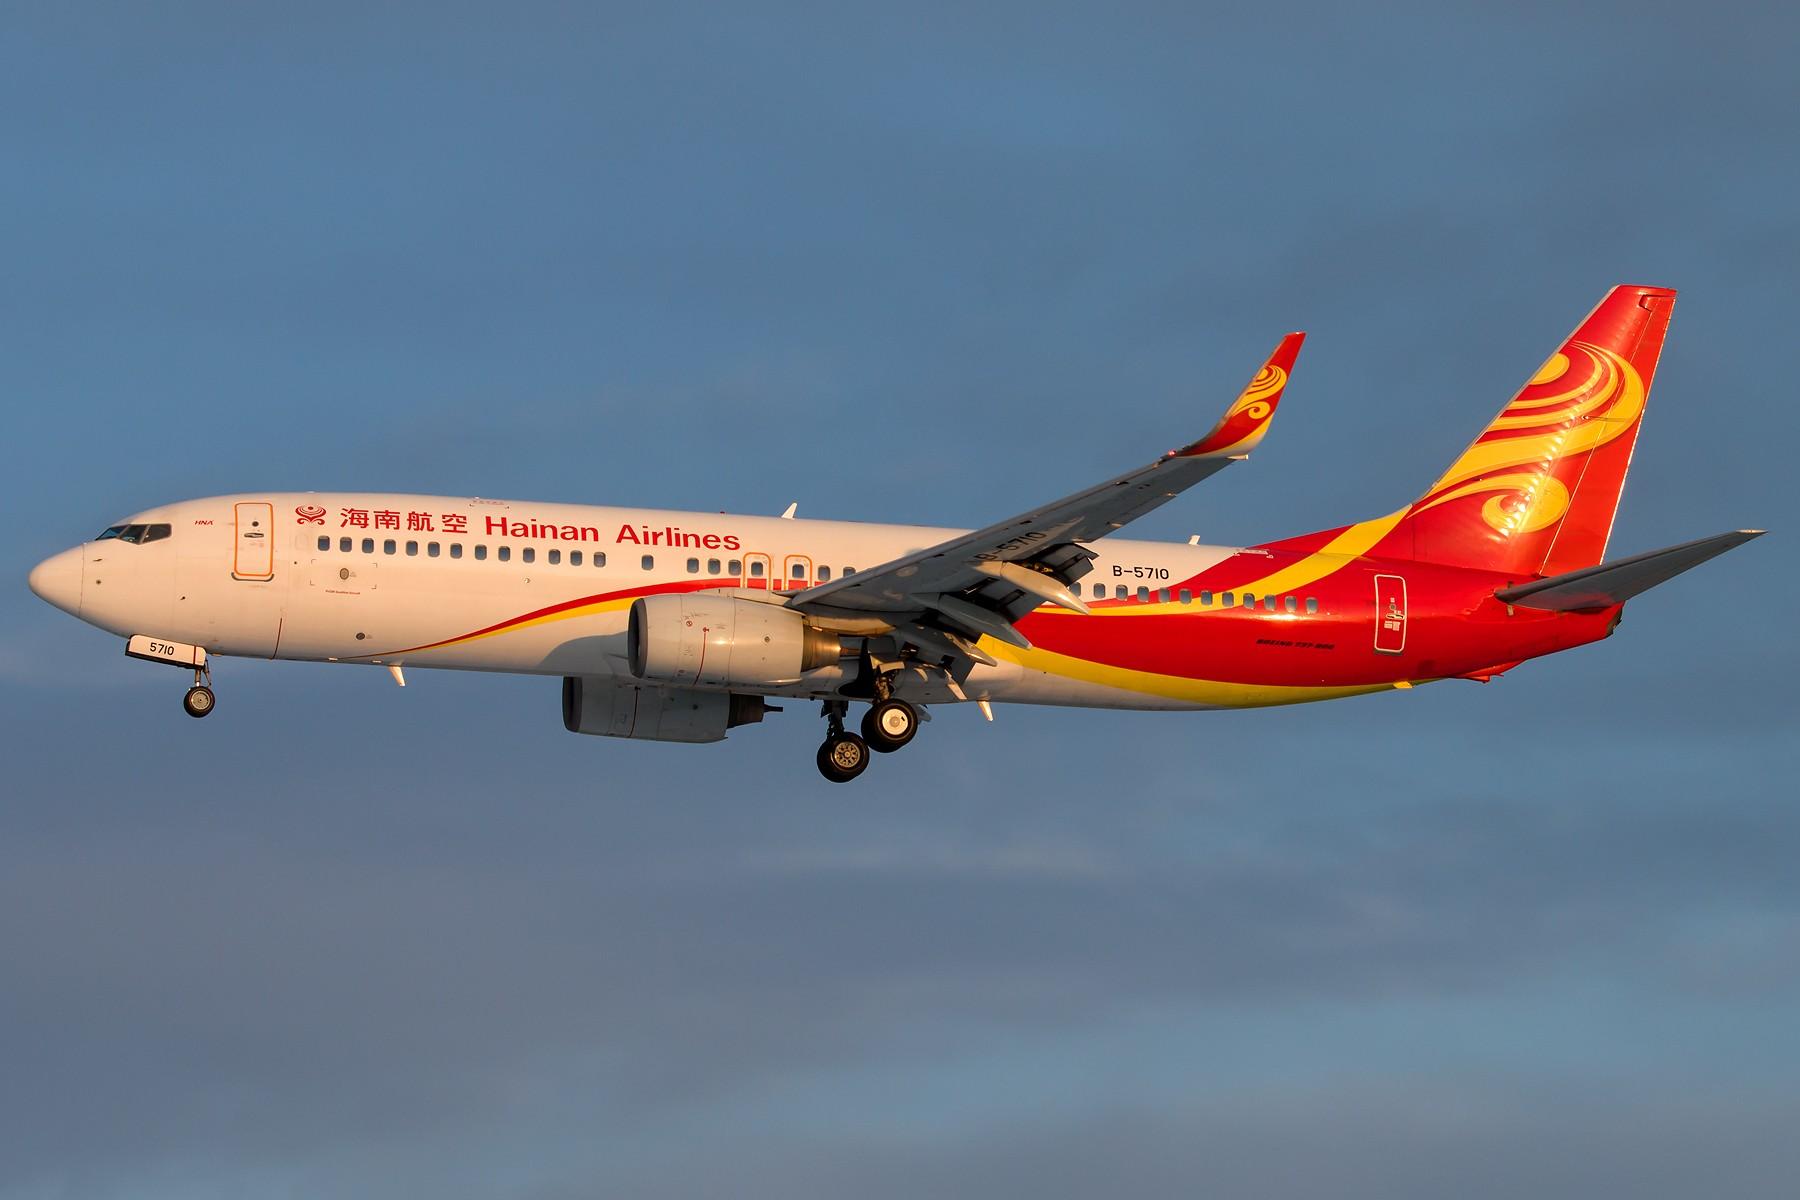 Re:[原创]雪里红 1800*1200 [5pics] BOEING 737-84P(WL) B-5710 中国北京首都国际机场